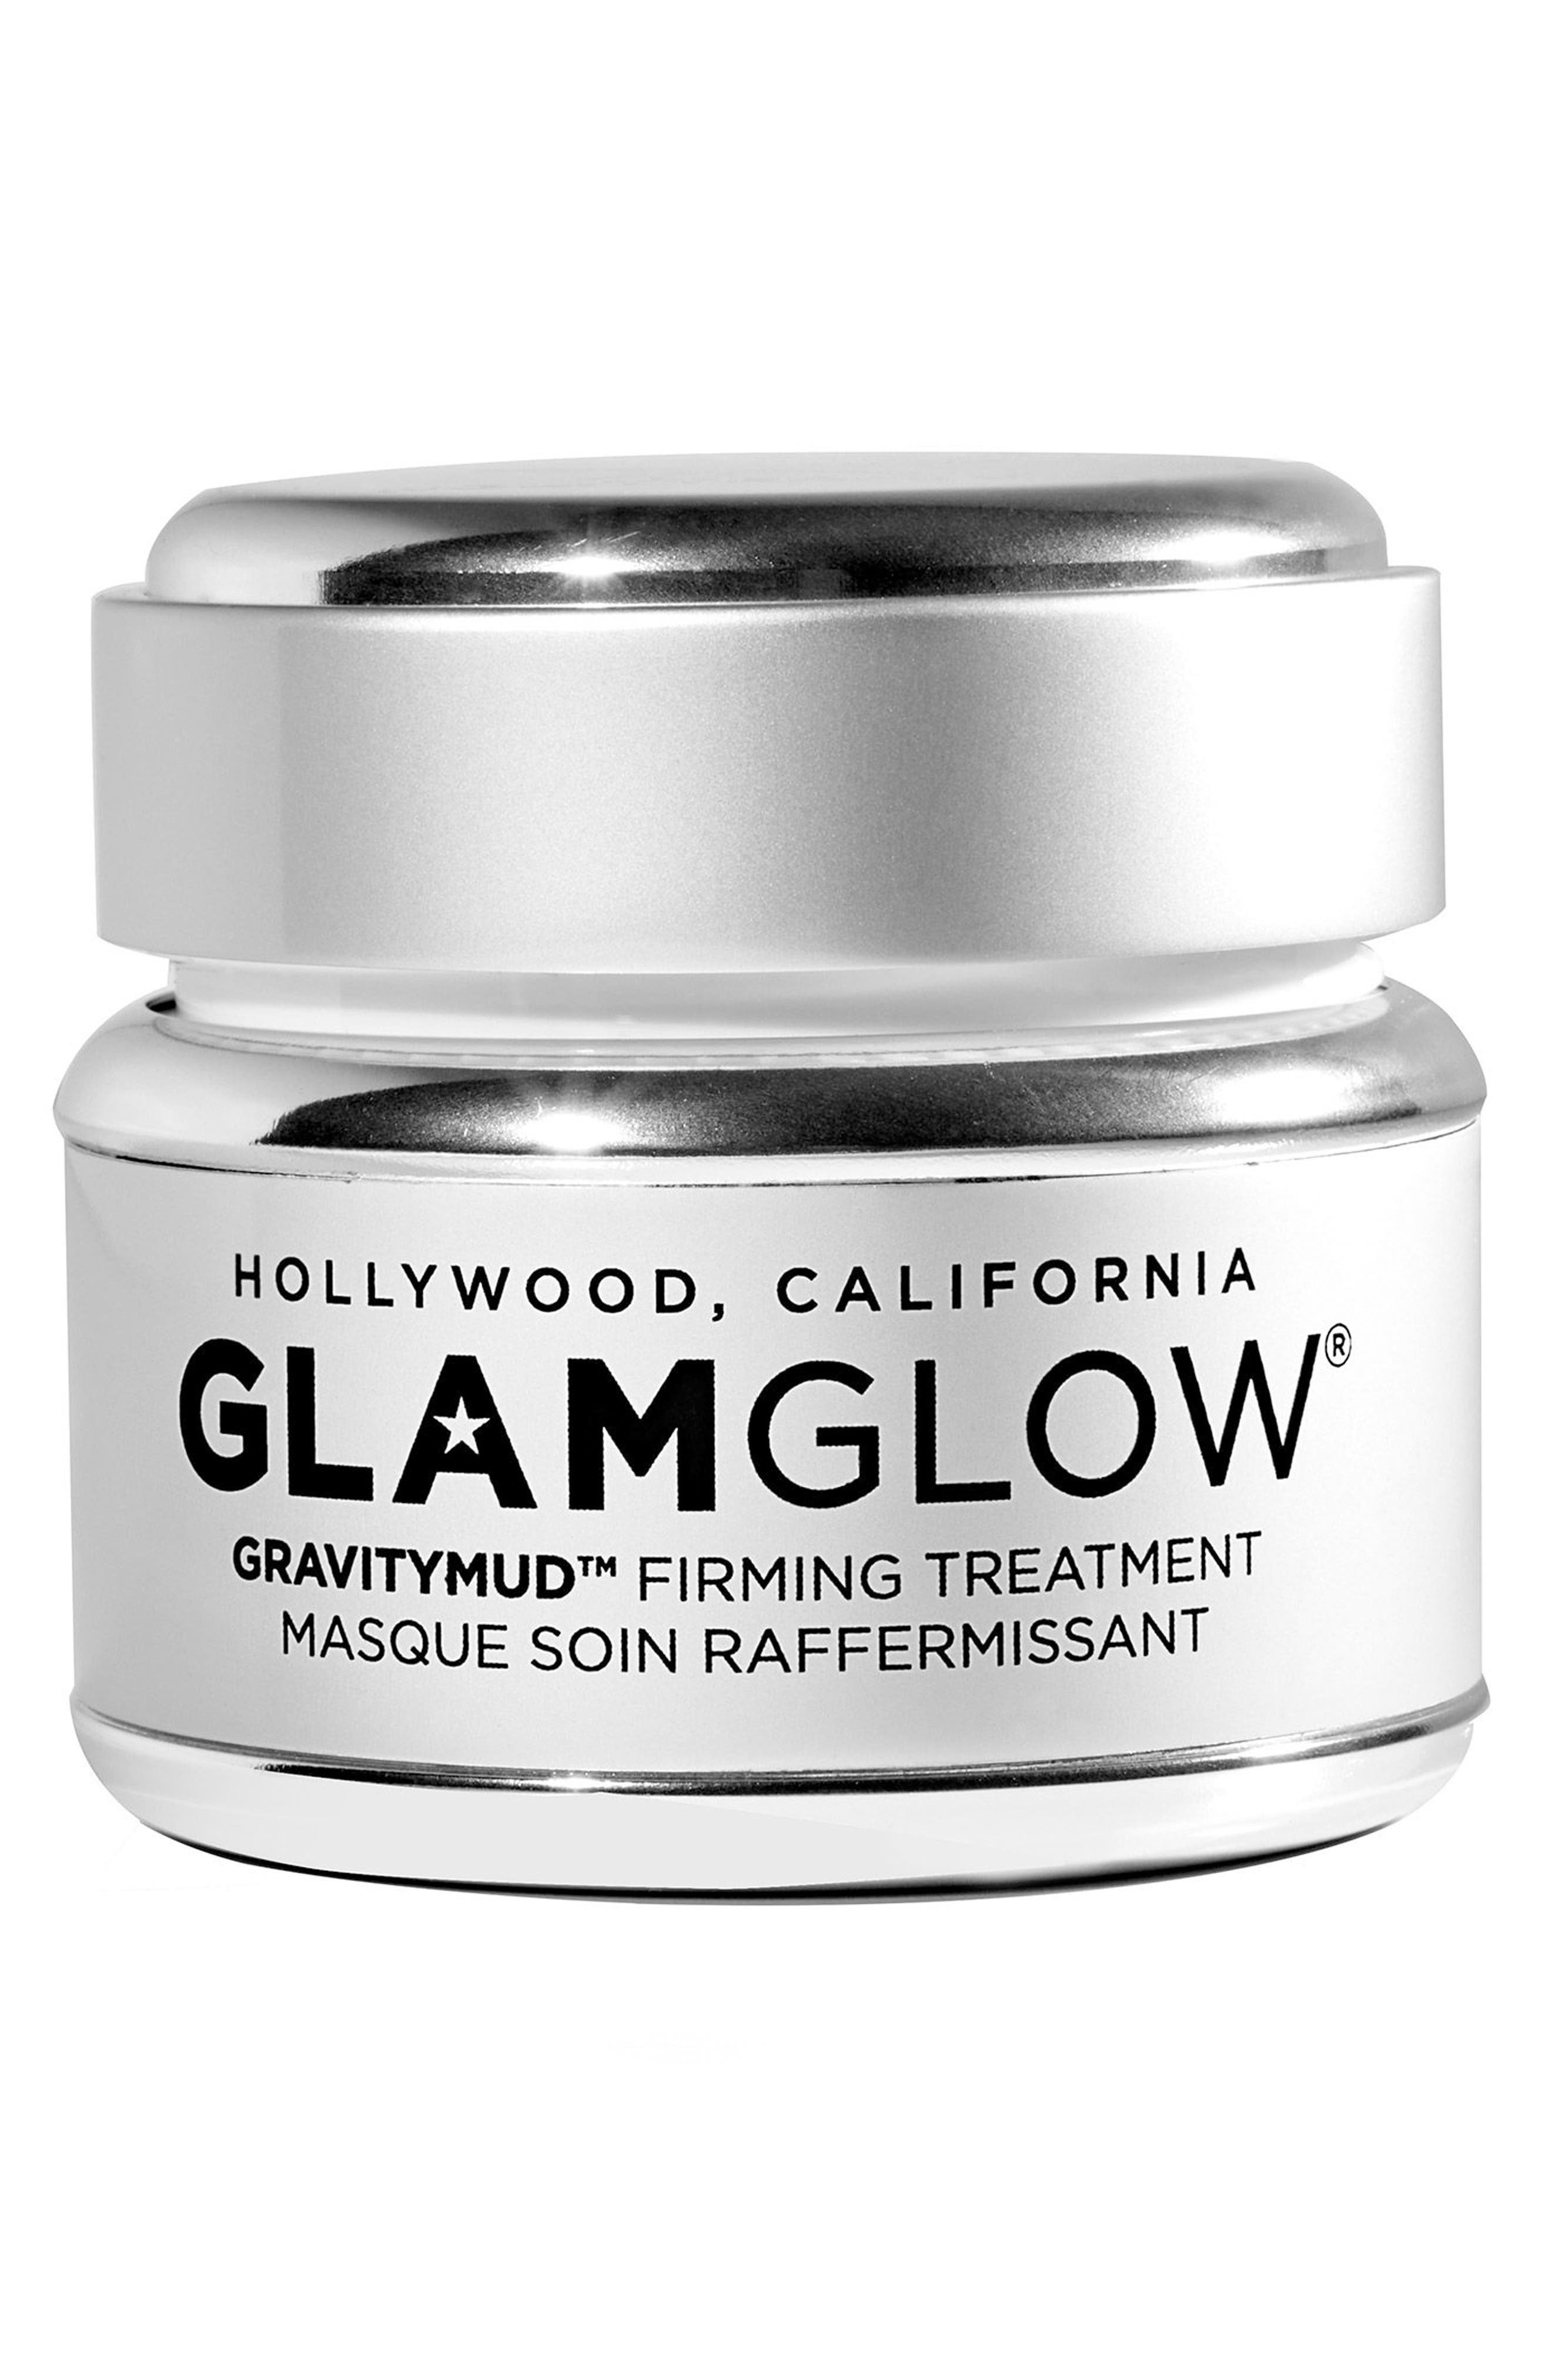 GLAMGLOW® GLITTERMASK GRAVITYMUD™ Firming Treatment